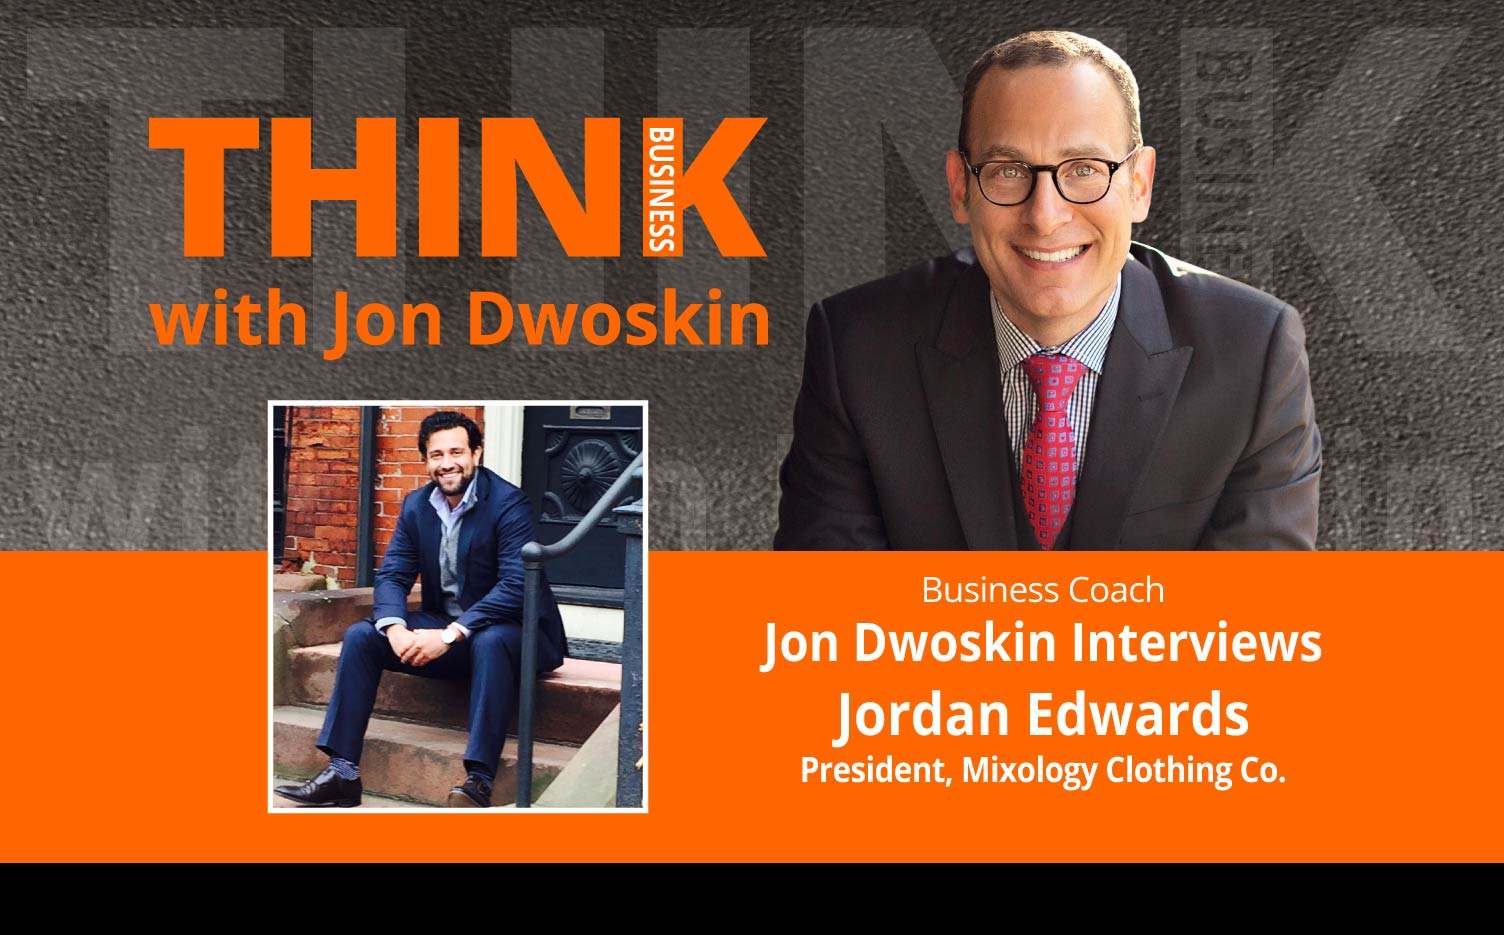 THINK Business Podcast: Jon Dwoskin Interviews Jordan Edwards, President, Mixology Clothing Co.